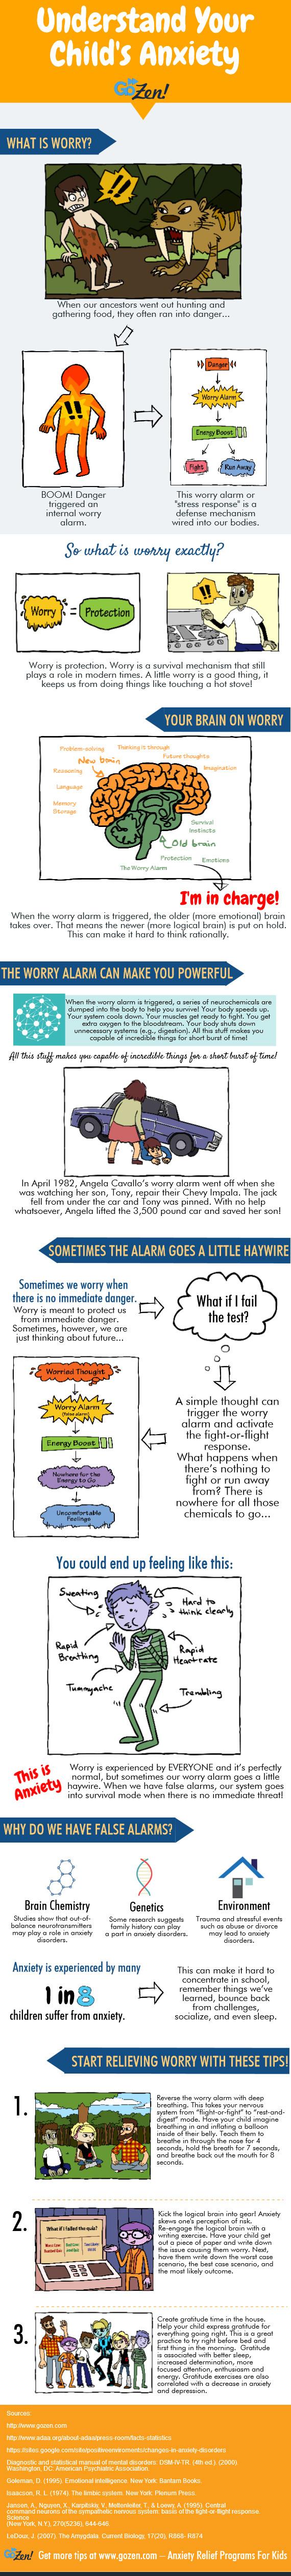 2014-10-13-ChildsAnxietyFinal.jpg